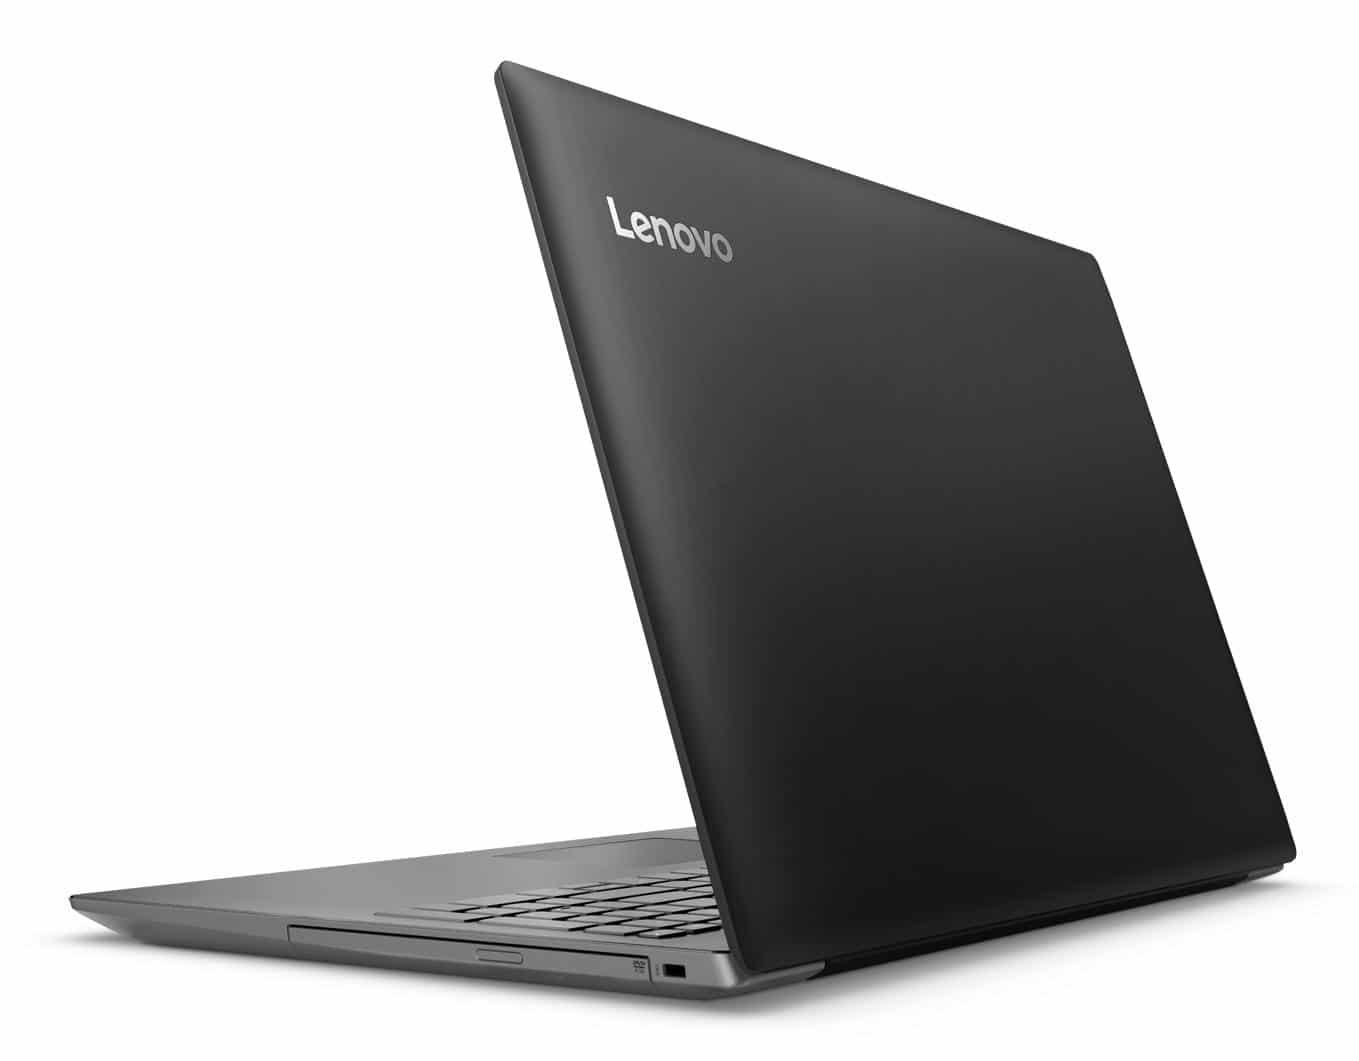 "Lenovo IdeaPad 320-15AST, PC portable 15"" SSD+HDD Stoney R530 pack 499€"